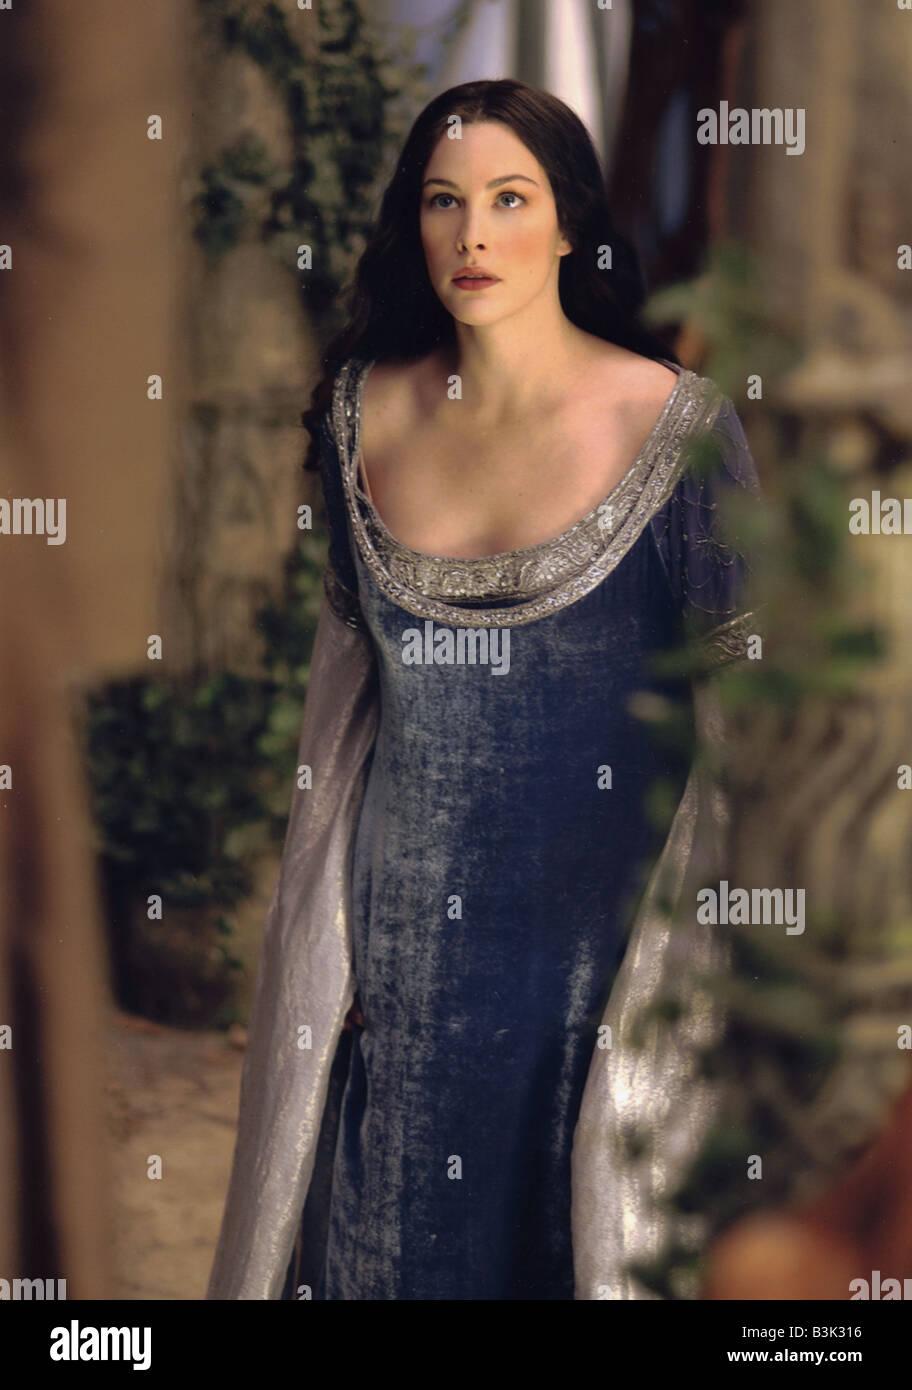 Arwen Immagini Arwen Fotos Stock Alamy